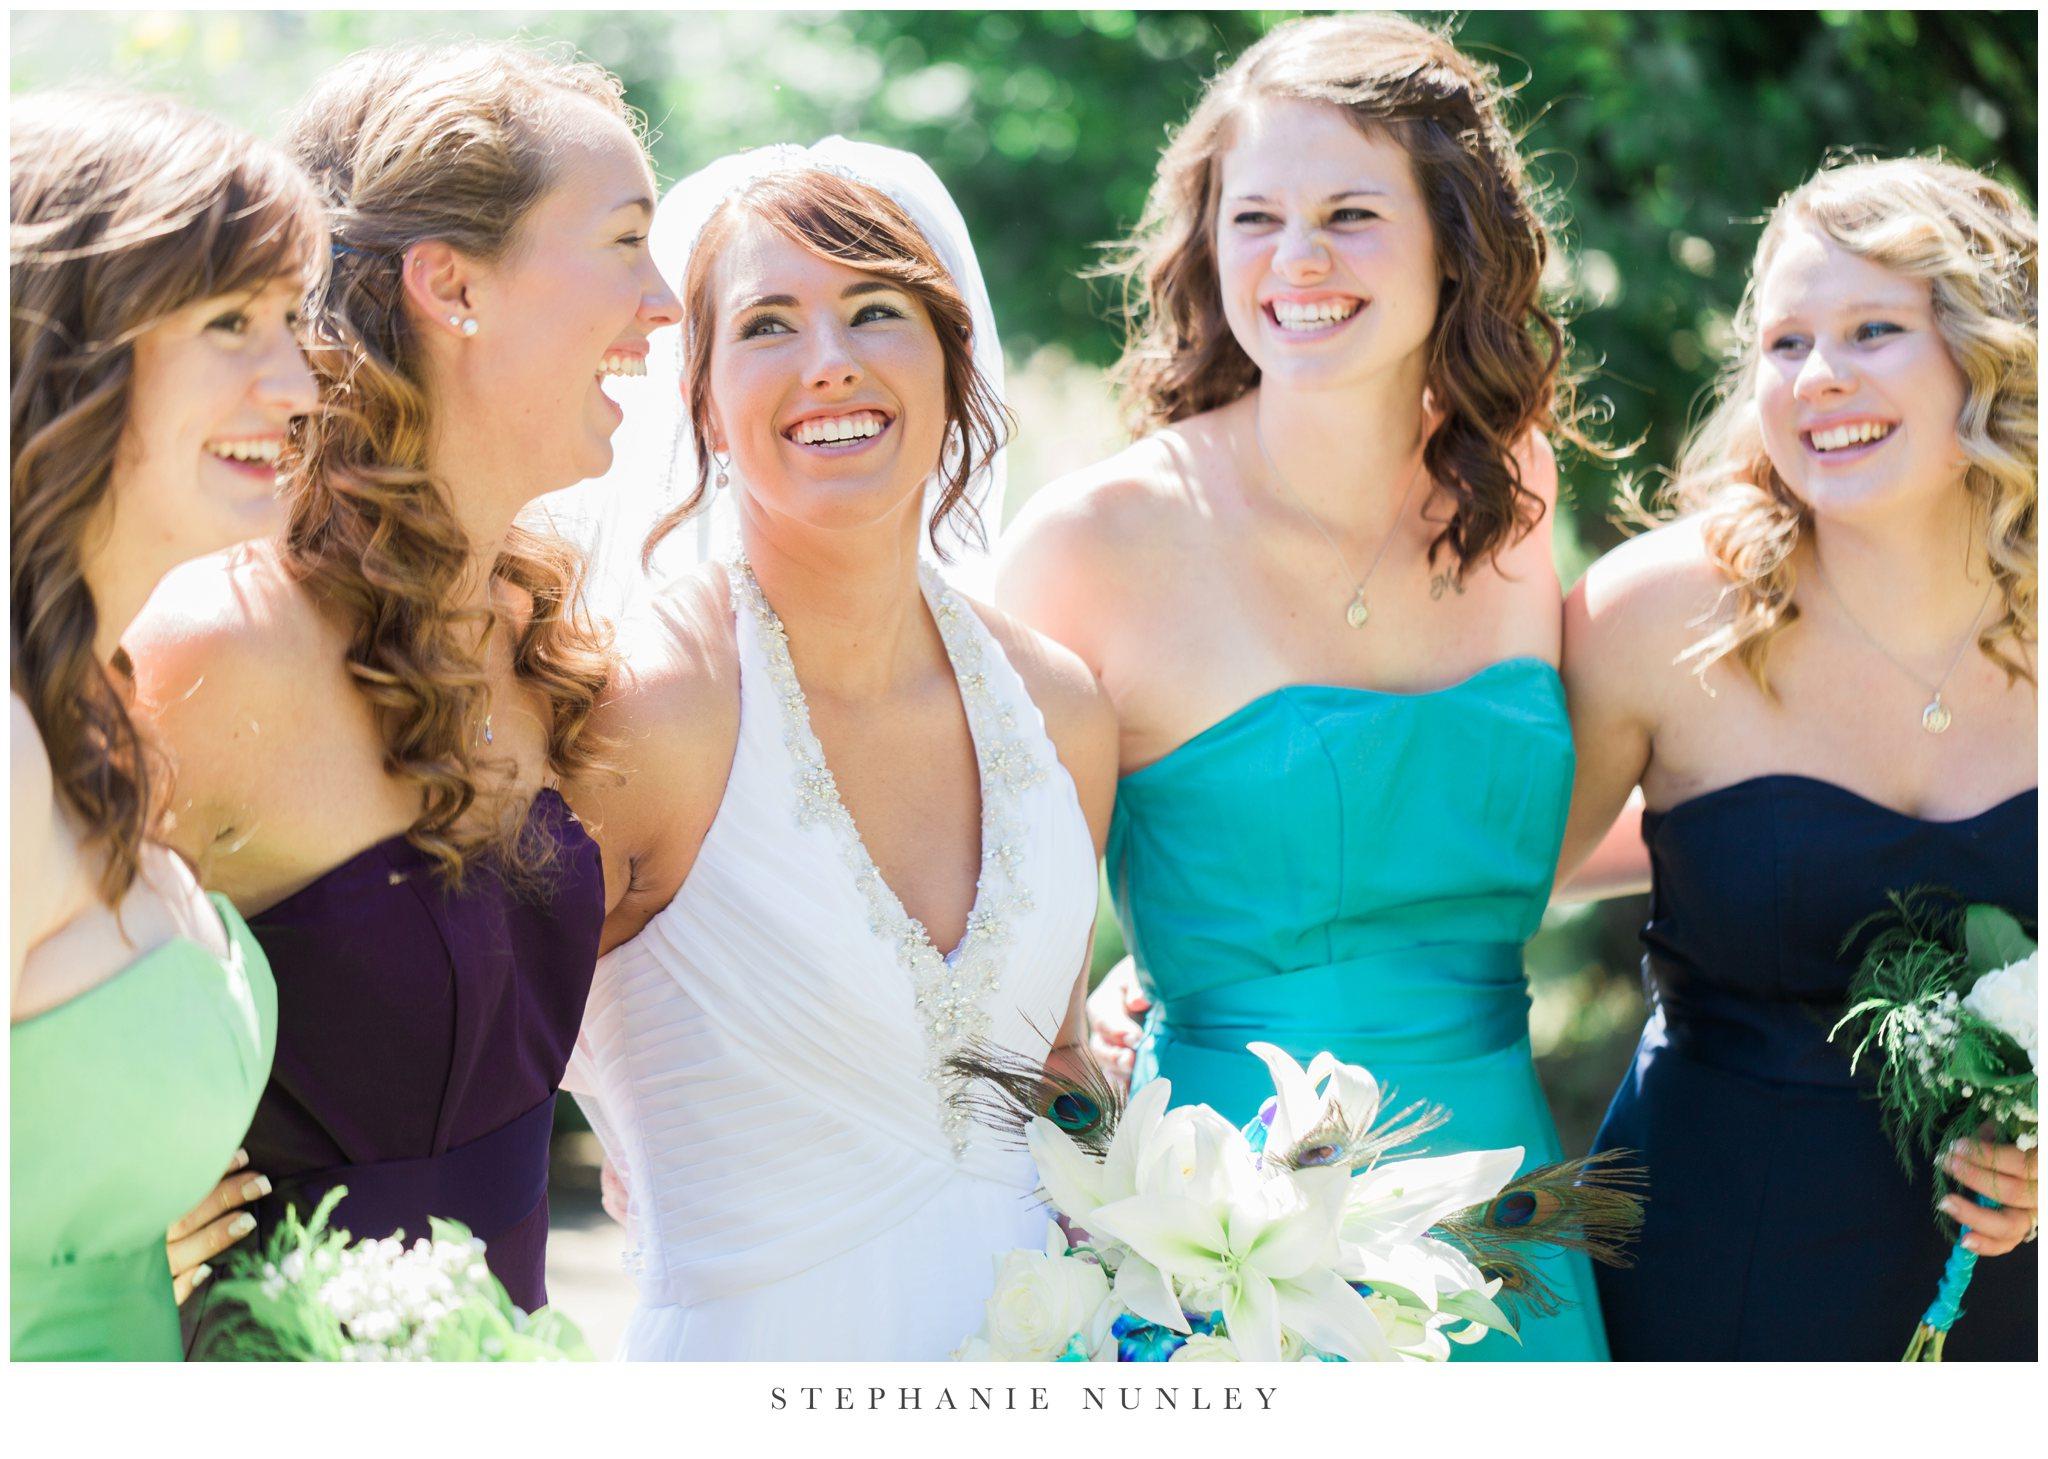 fine-art-destination-wedding-photographer-0030.jpg